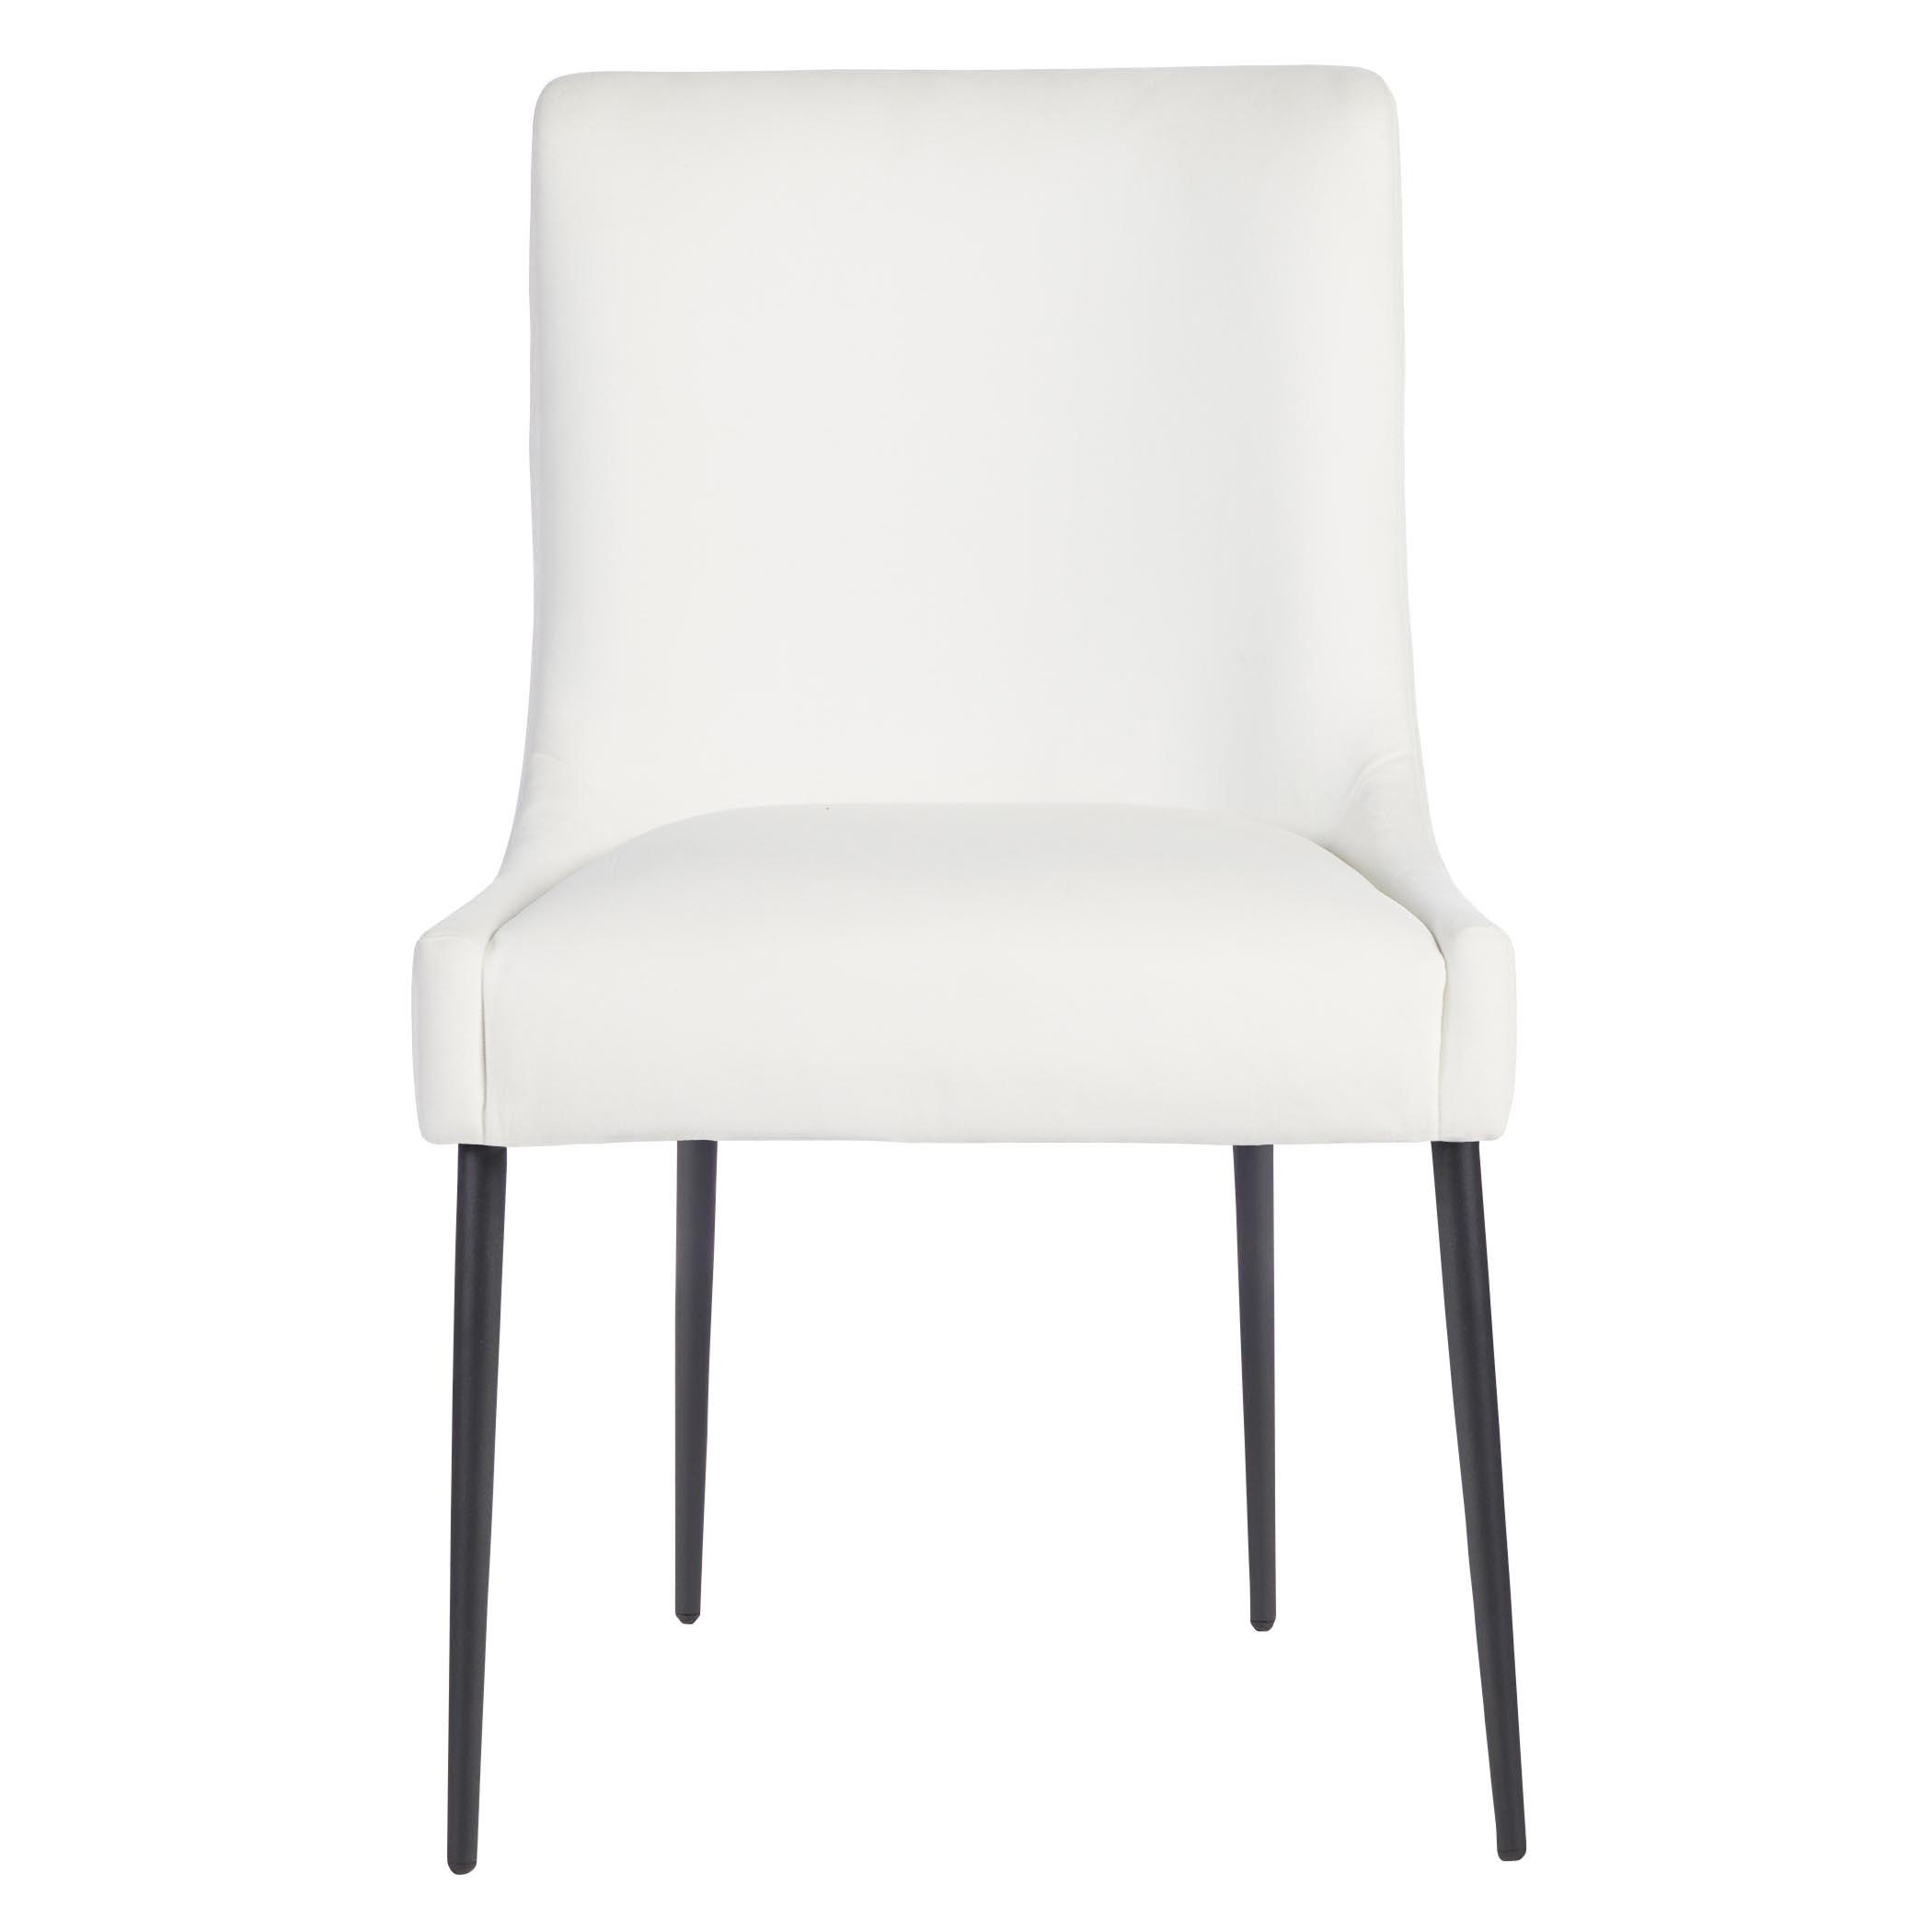 Elinor Dining Chair - Matte Black